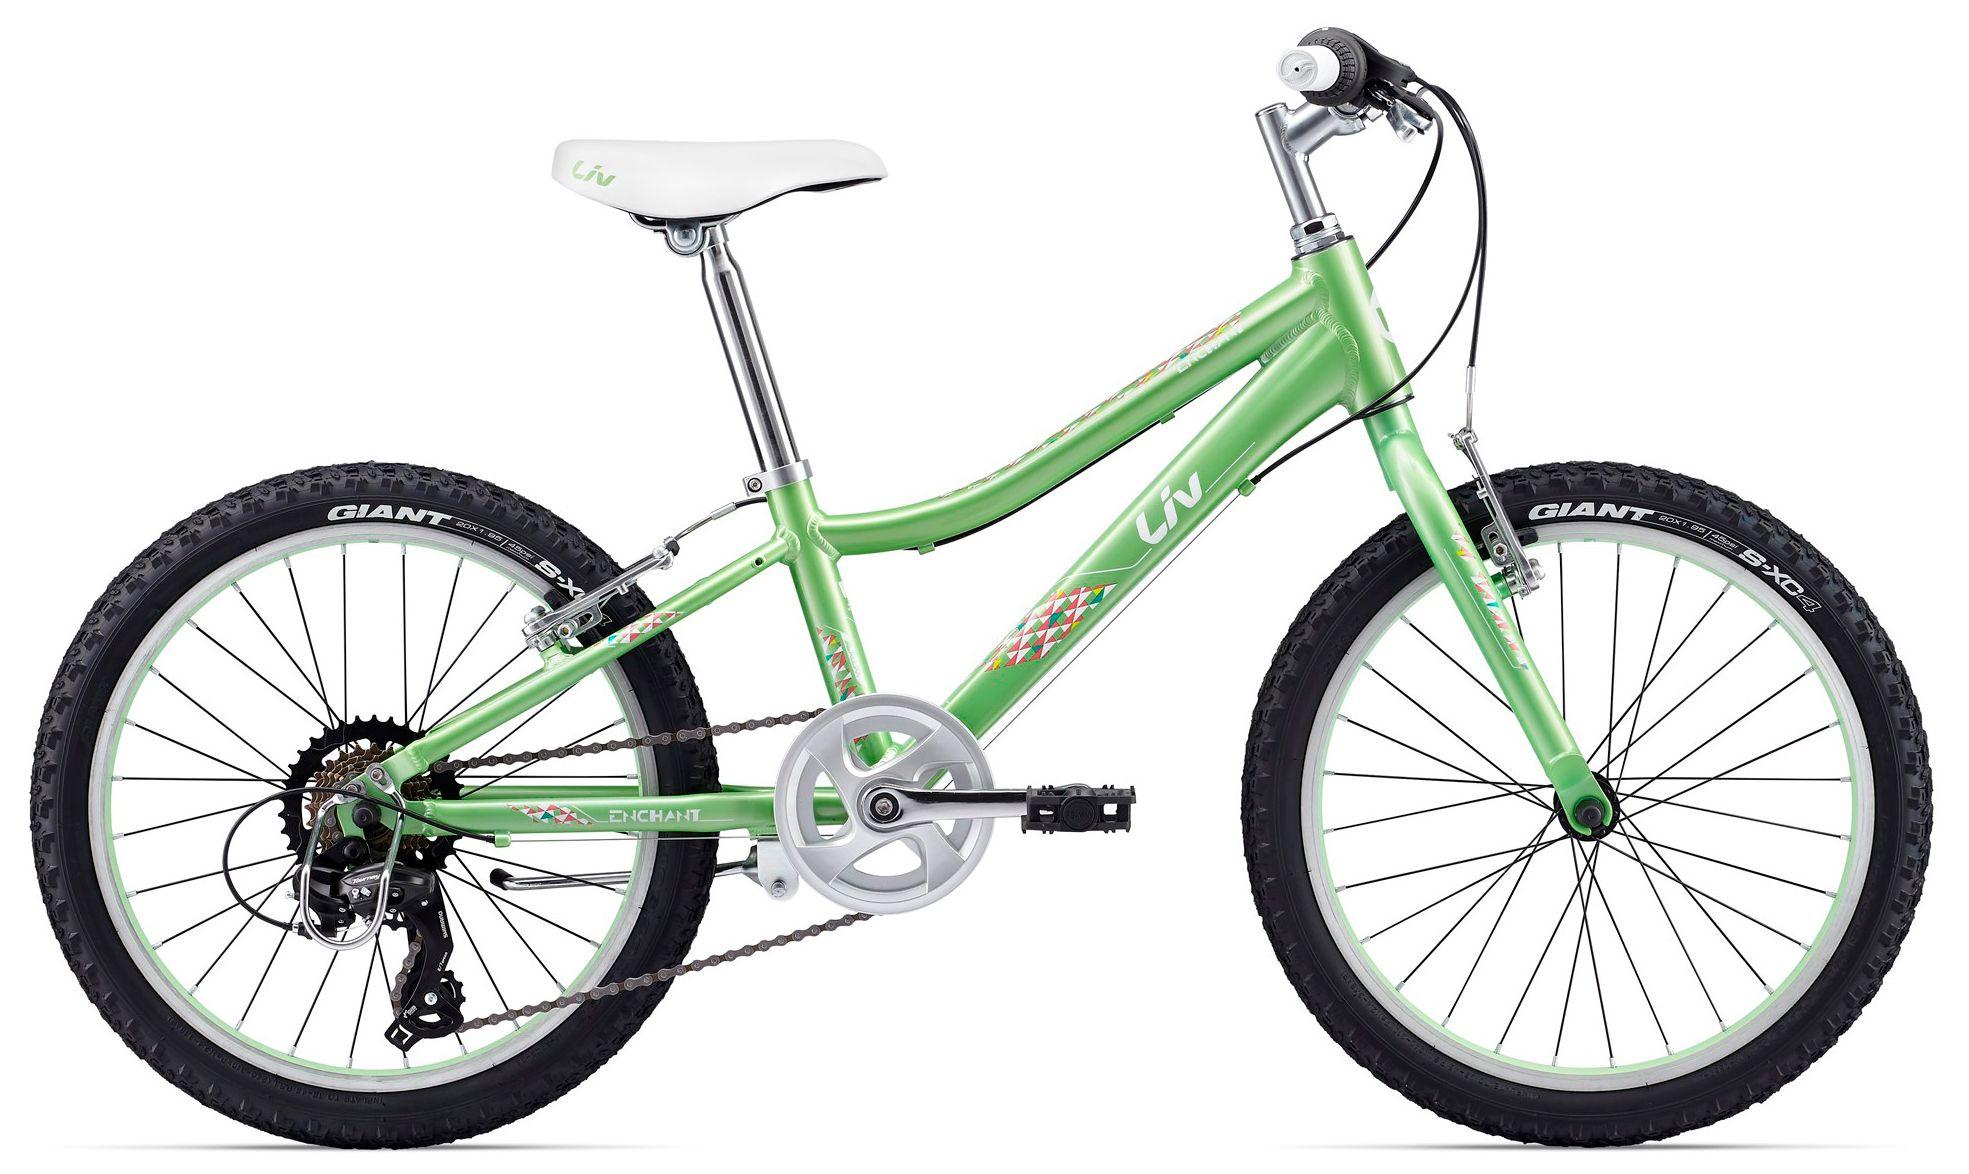 цена на Велосипед Giant Enchant 20 Lite 2017